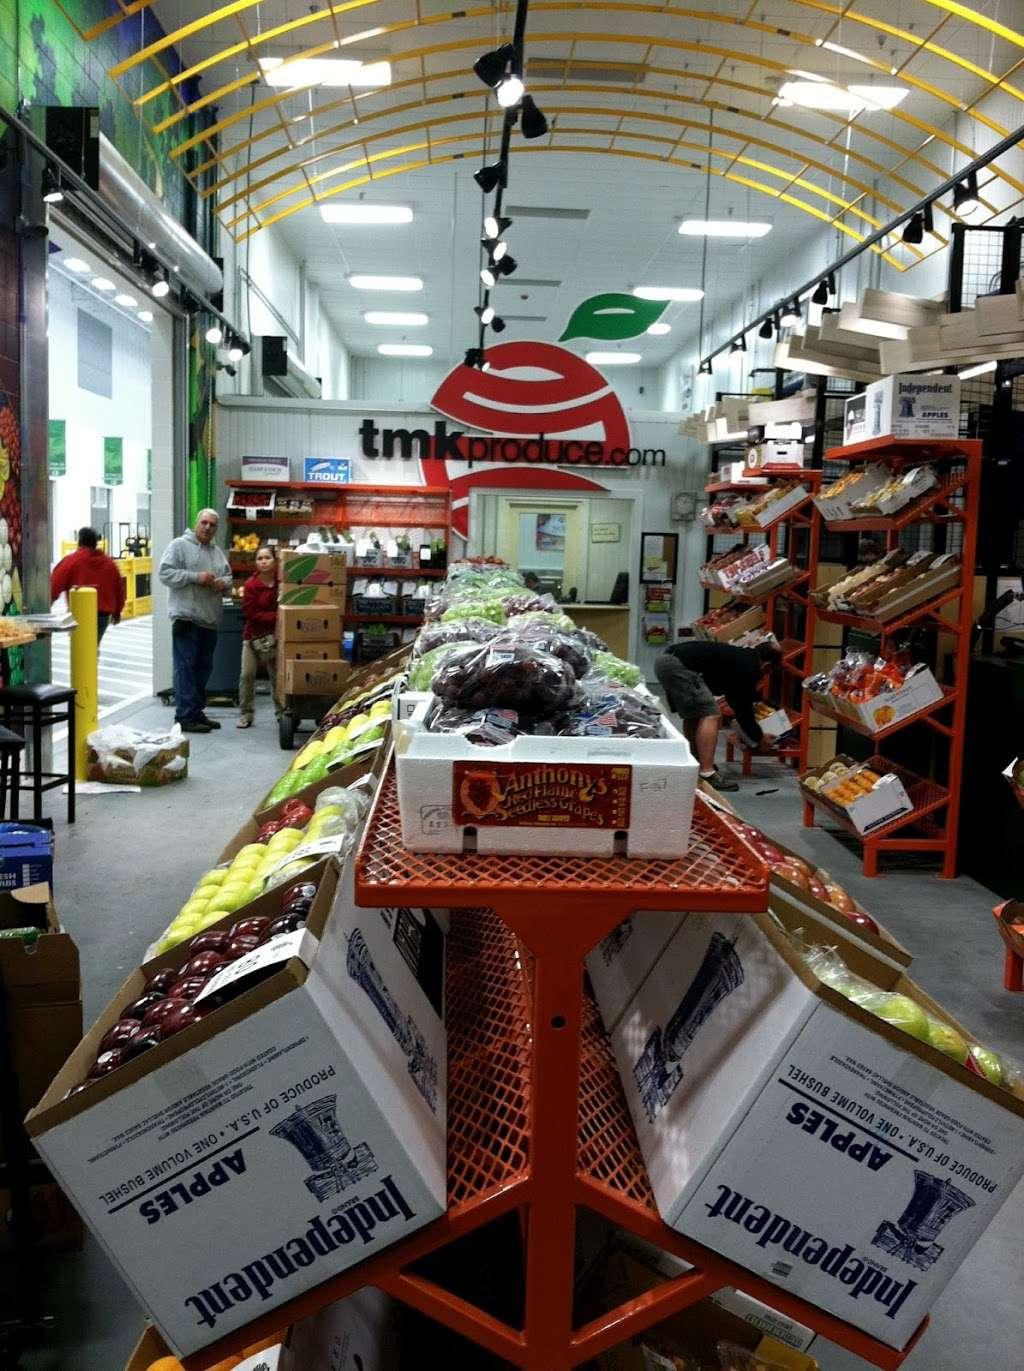 T. M. Kovacevich Wholesale Fruit and Produce - store  | Photo 10 of 10 | Address: 6700 Essington Ave, Philadelphia, PA 19153, USA | Phone: (215) 336-3160